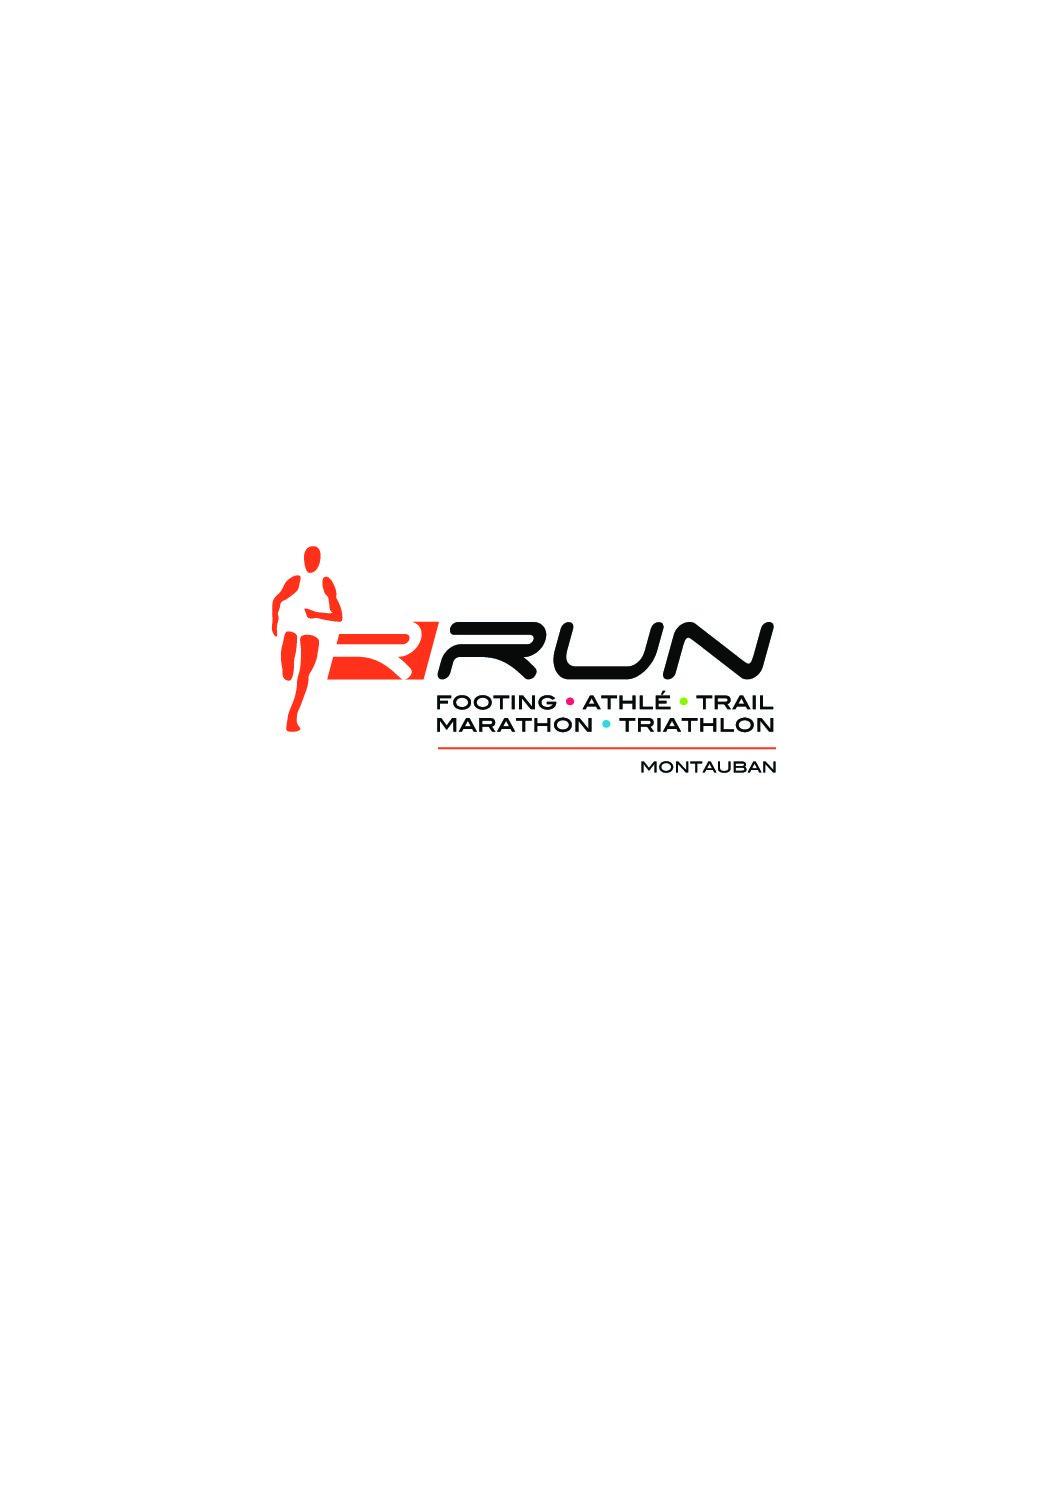 Logo MAILLOT RRUN-coul_MONTAUBAN 1